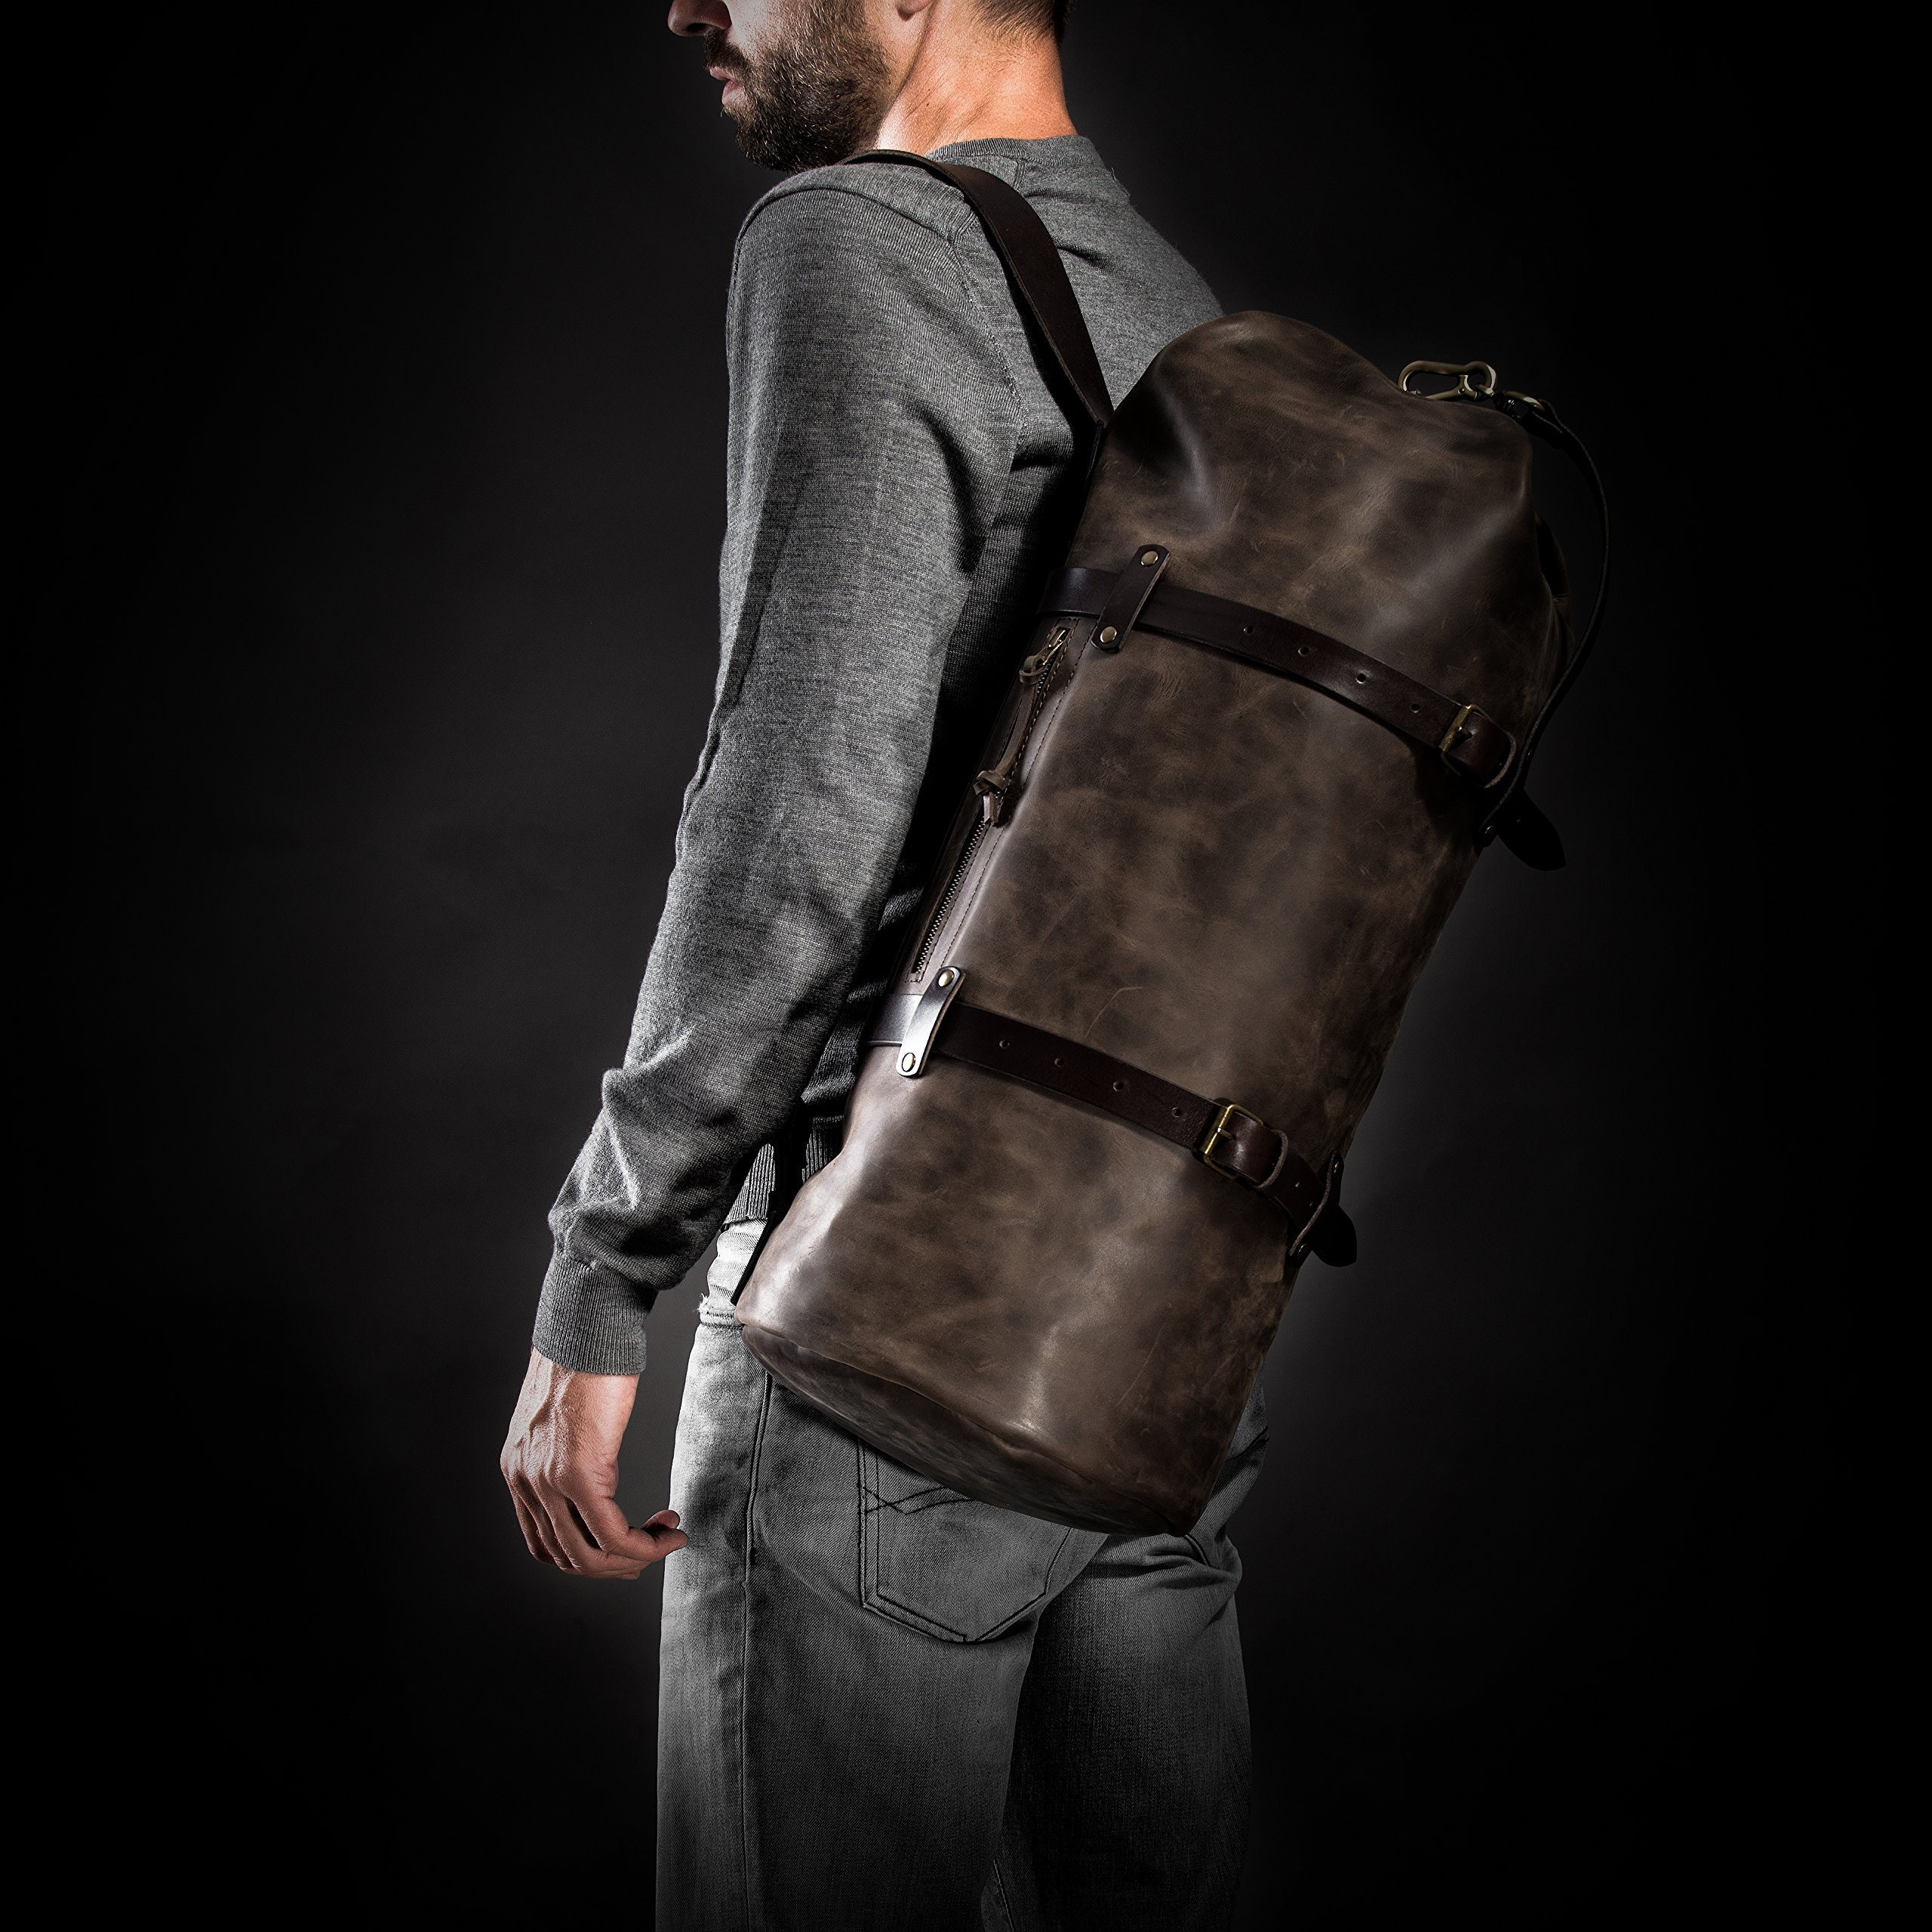 Duffel Pack by Kruk Garage Duffel bag Travel bag Leather men's bag Brown Leather duffle bag Weekender Men's gift Christmas gift Luggage